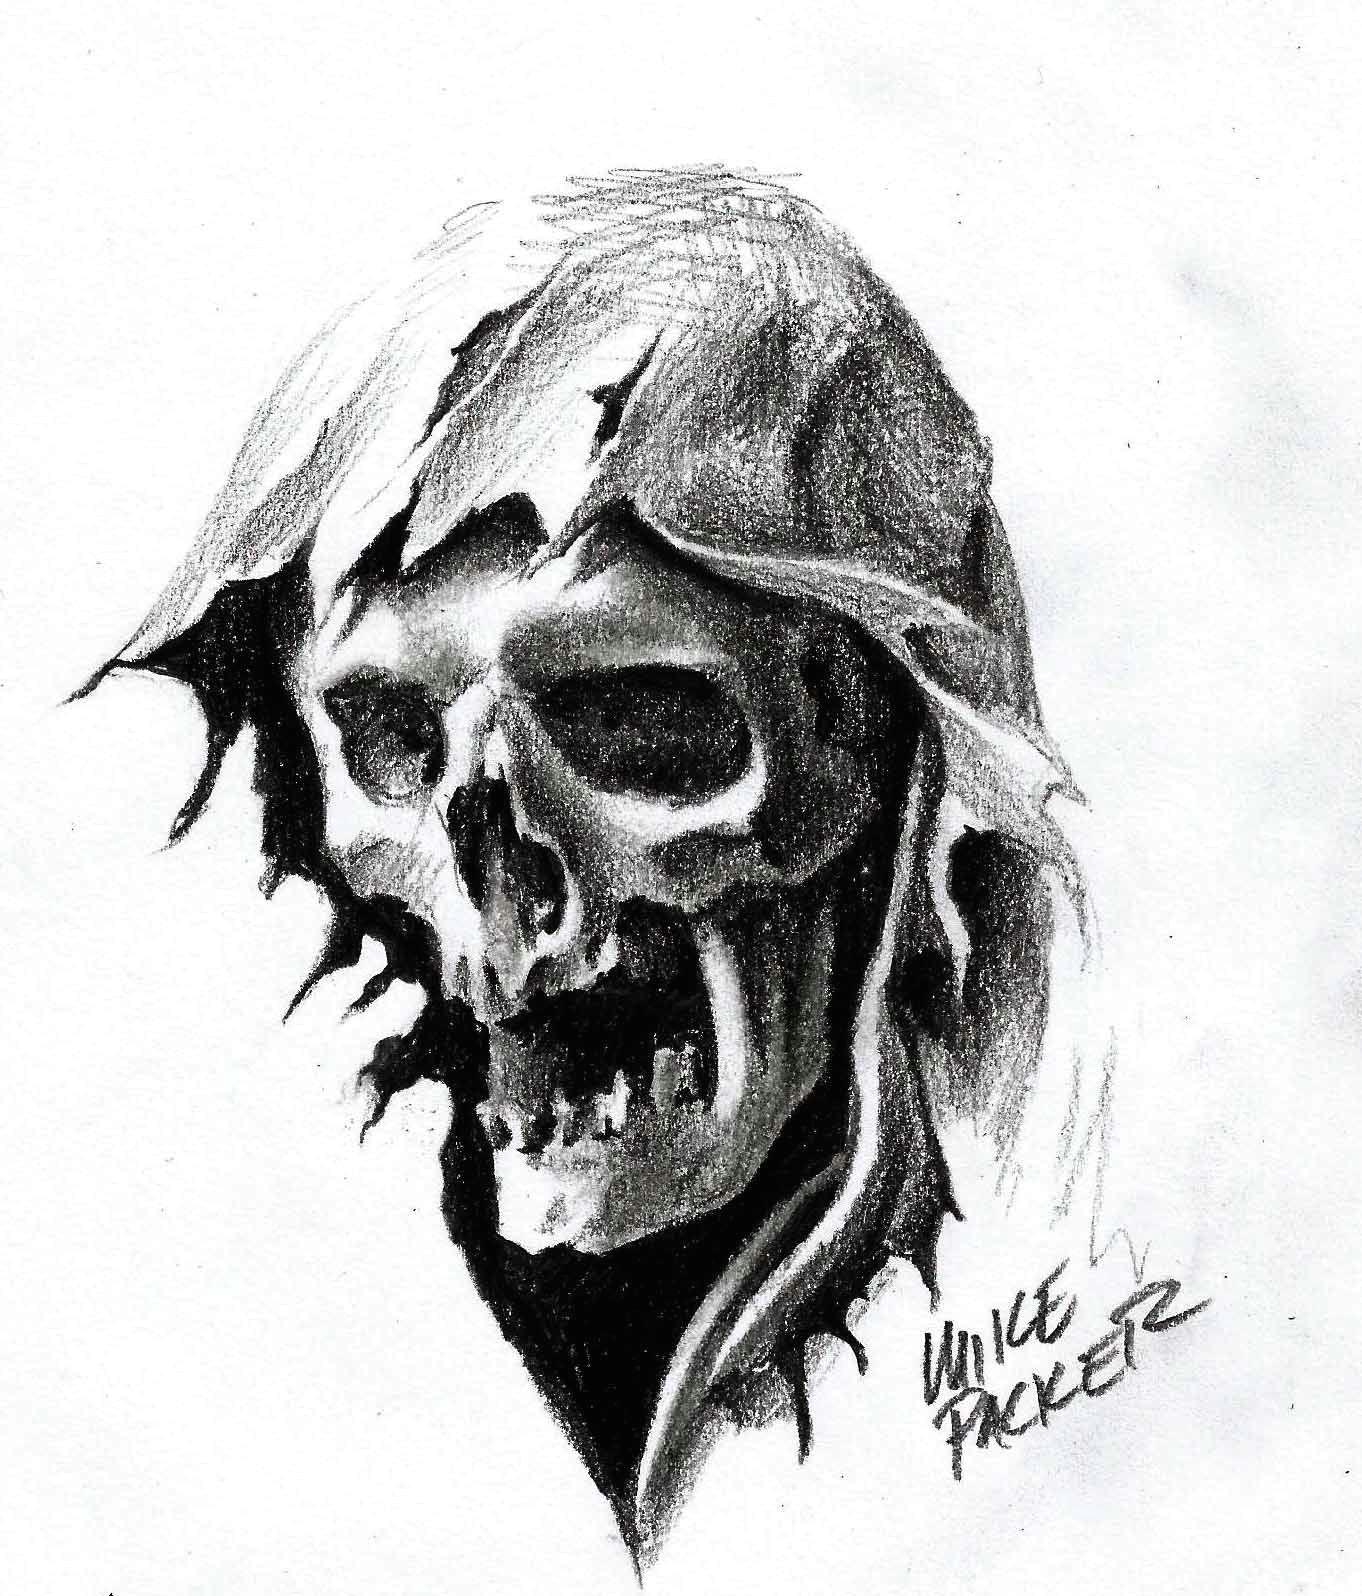 Skull Drawing Grim Reaper Mike Packer Reaper Head Graphite Pencil Art Pinterest